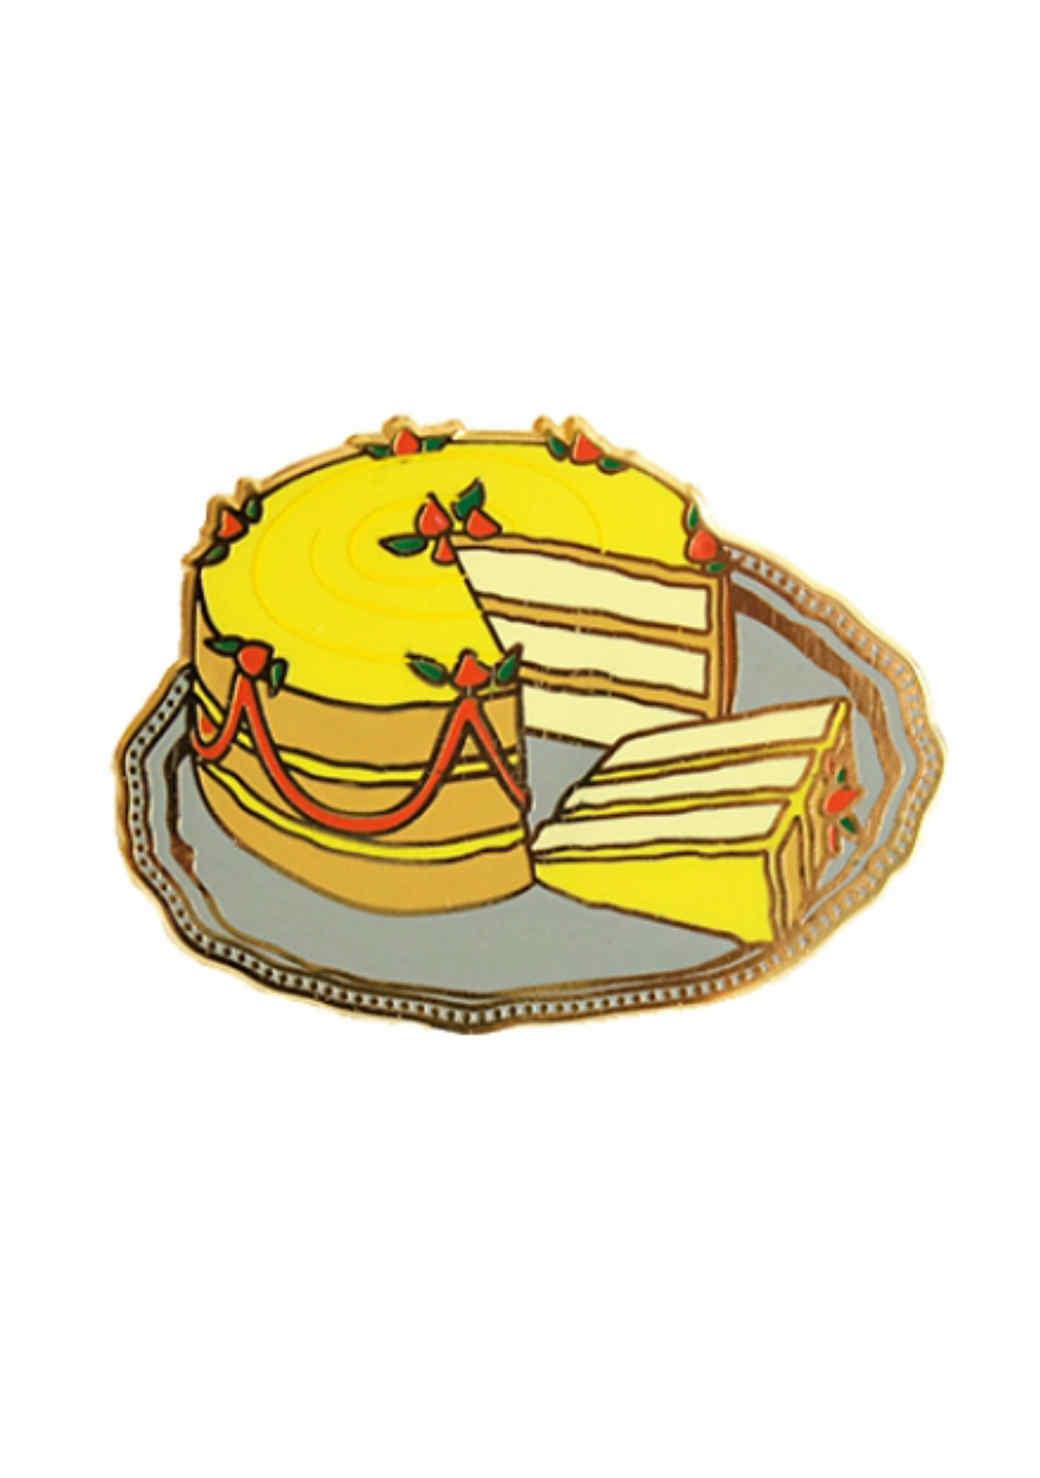 martha-stewart-pins-cake.jpg (skyword:363794)